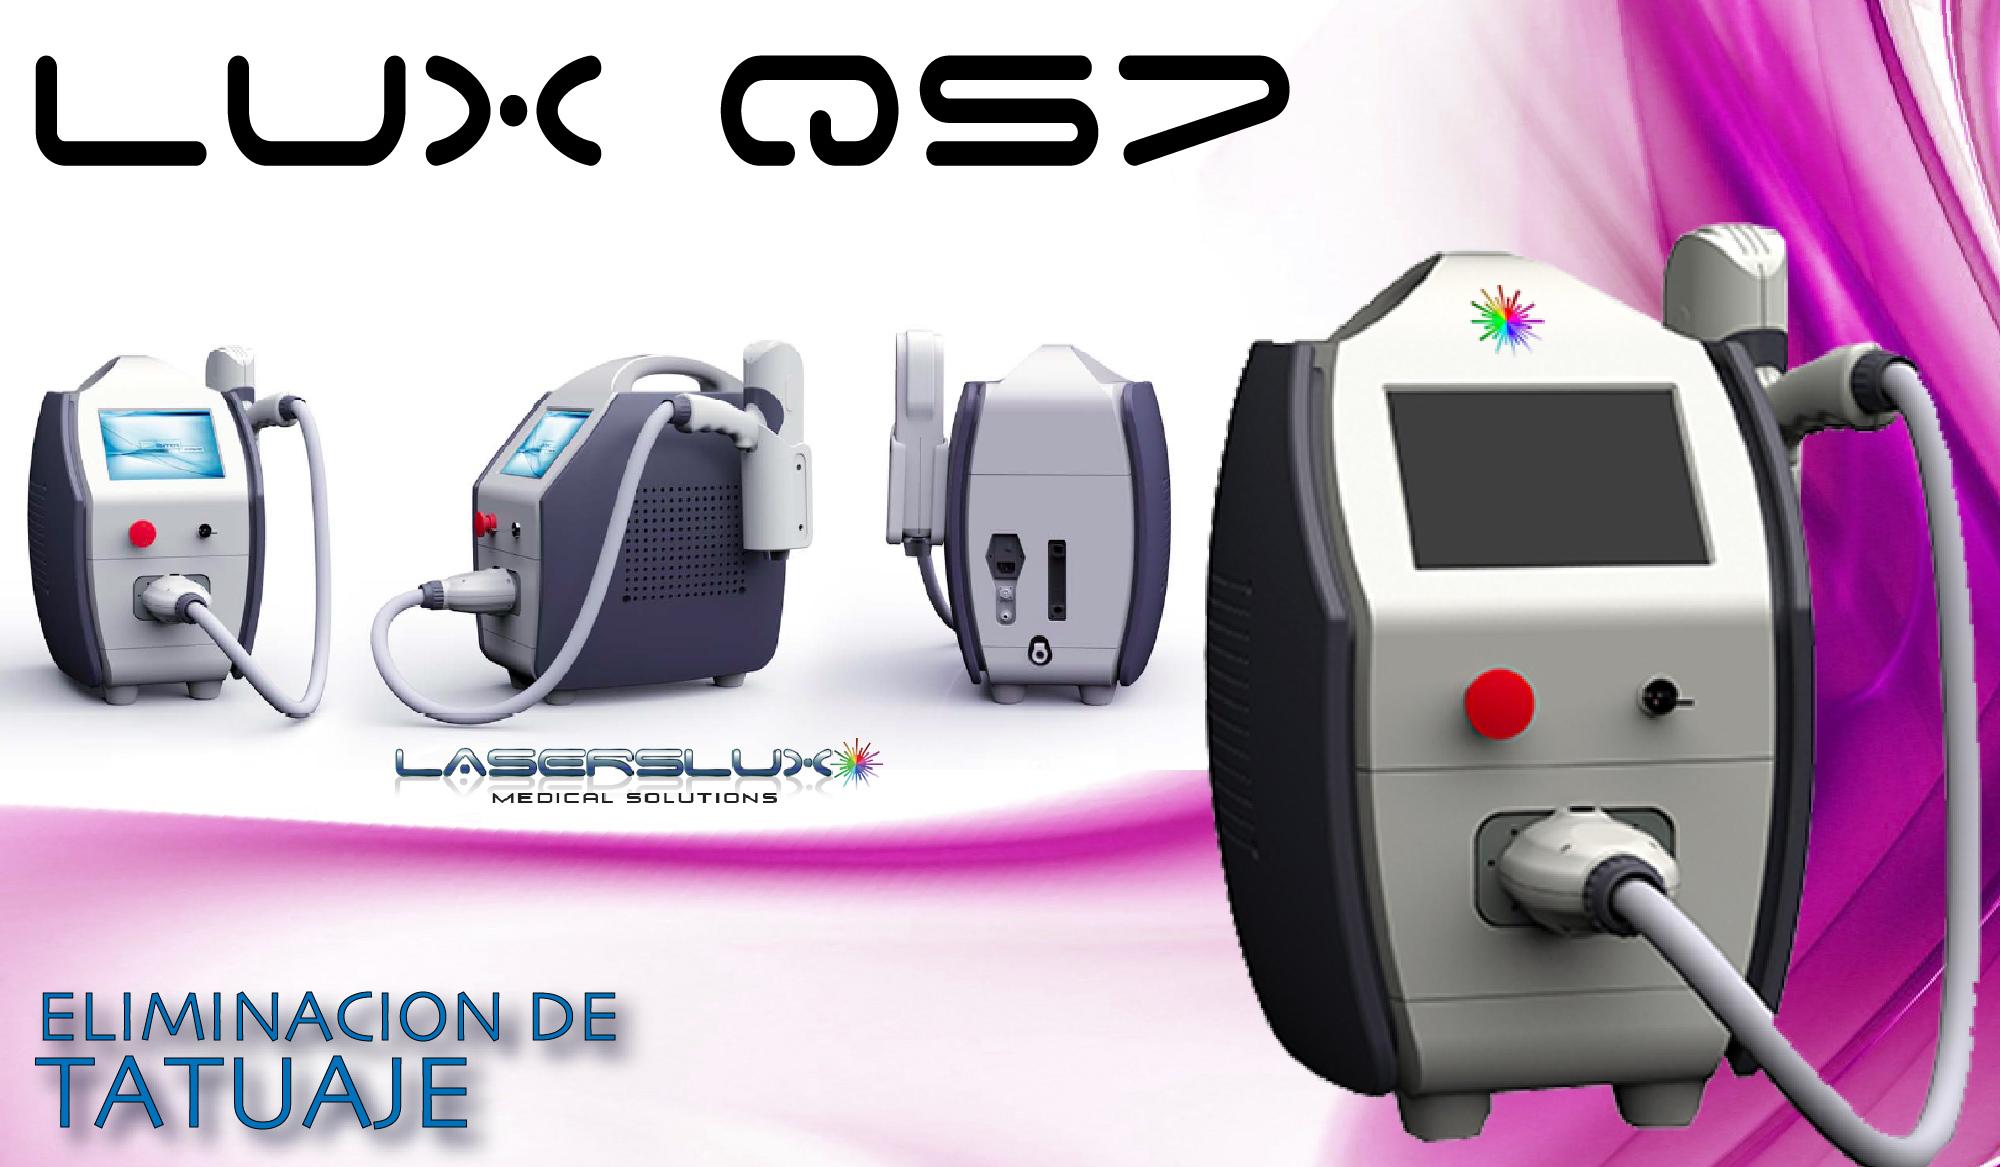 Para Quitar Tatuajes laser nd yag q-switched | tatuajes - laserslux